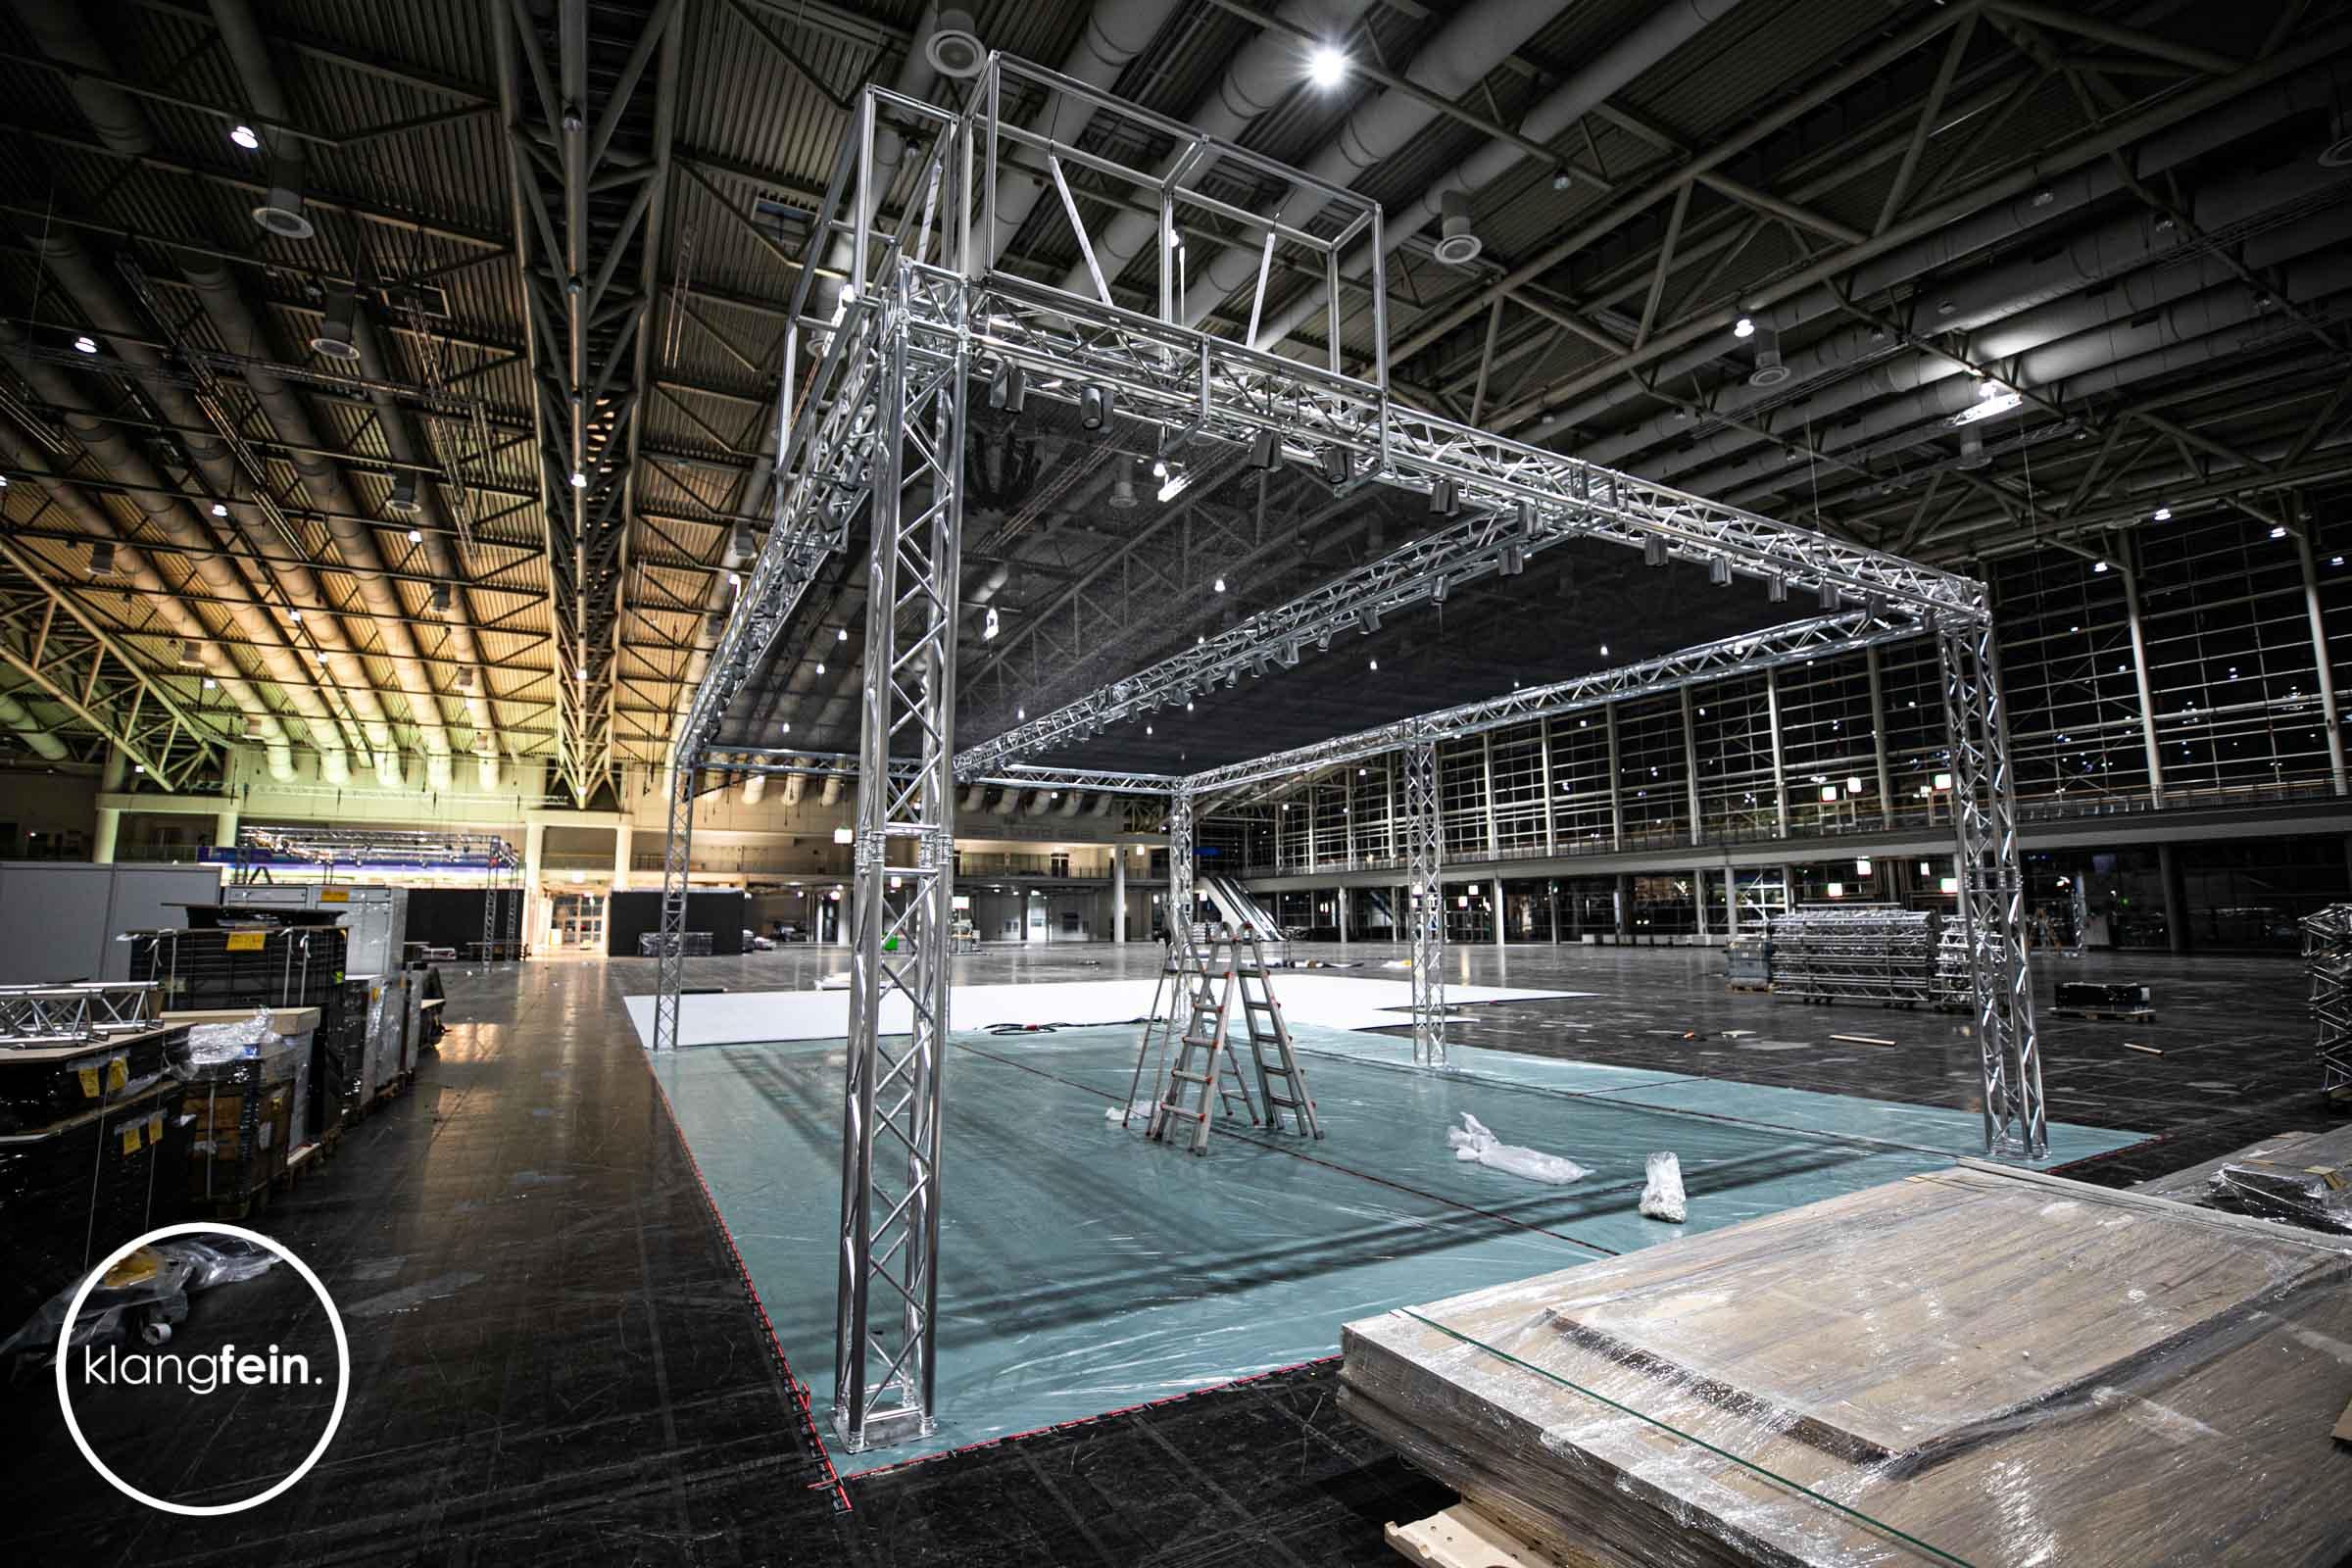 Messebau   Hannover   Frankfurt   Hamburg   Construcion   Plannung   Flooring   Transport   Light   Sound   Truss